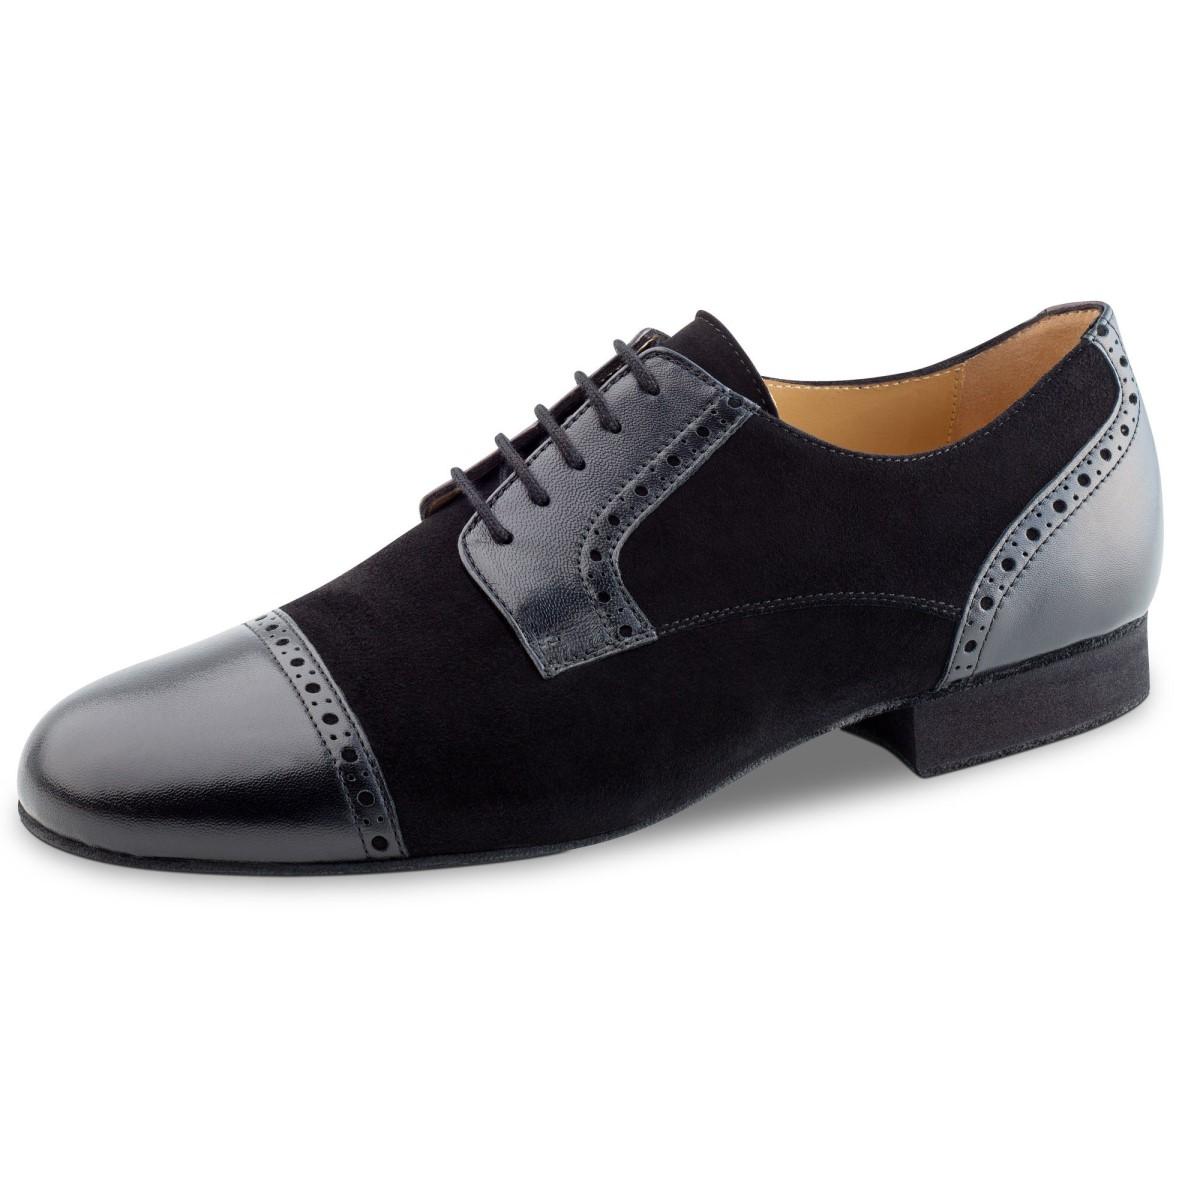 Zapatos azules con cordones Werner Kern para hombre YXKUoP